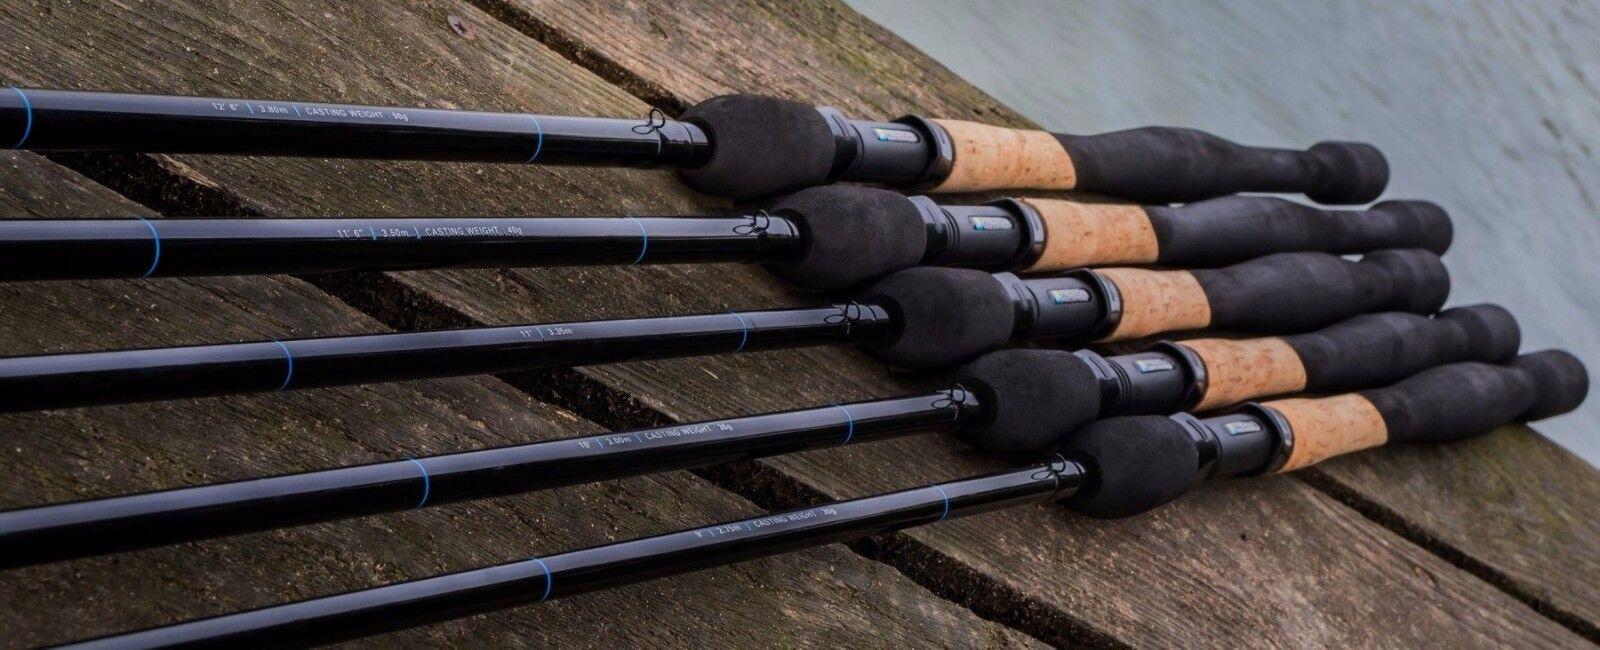 Preston Innovations Carbonactive Supera Match Fishing Rod Range